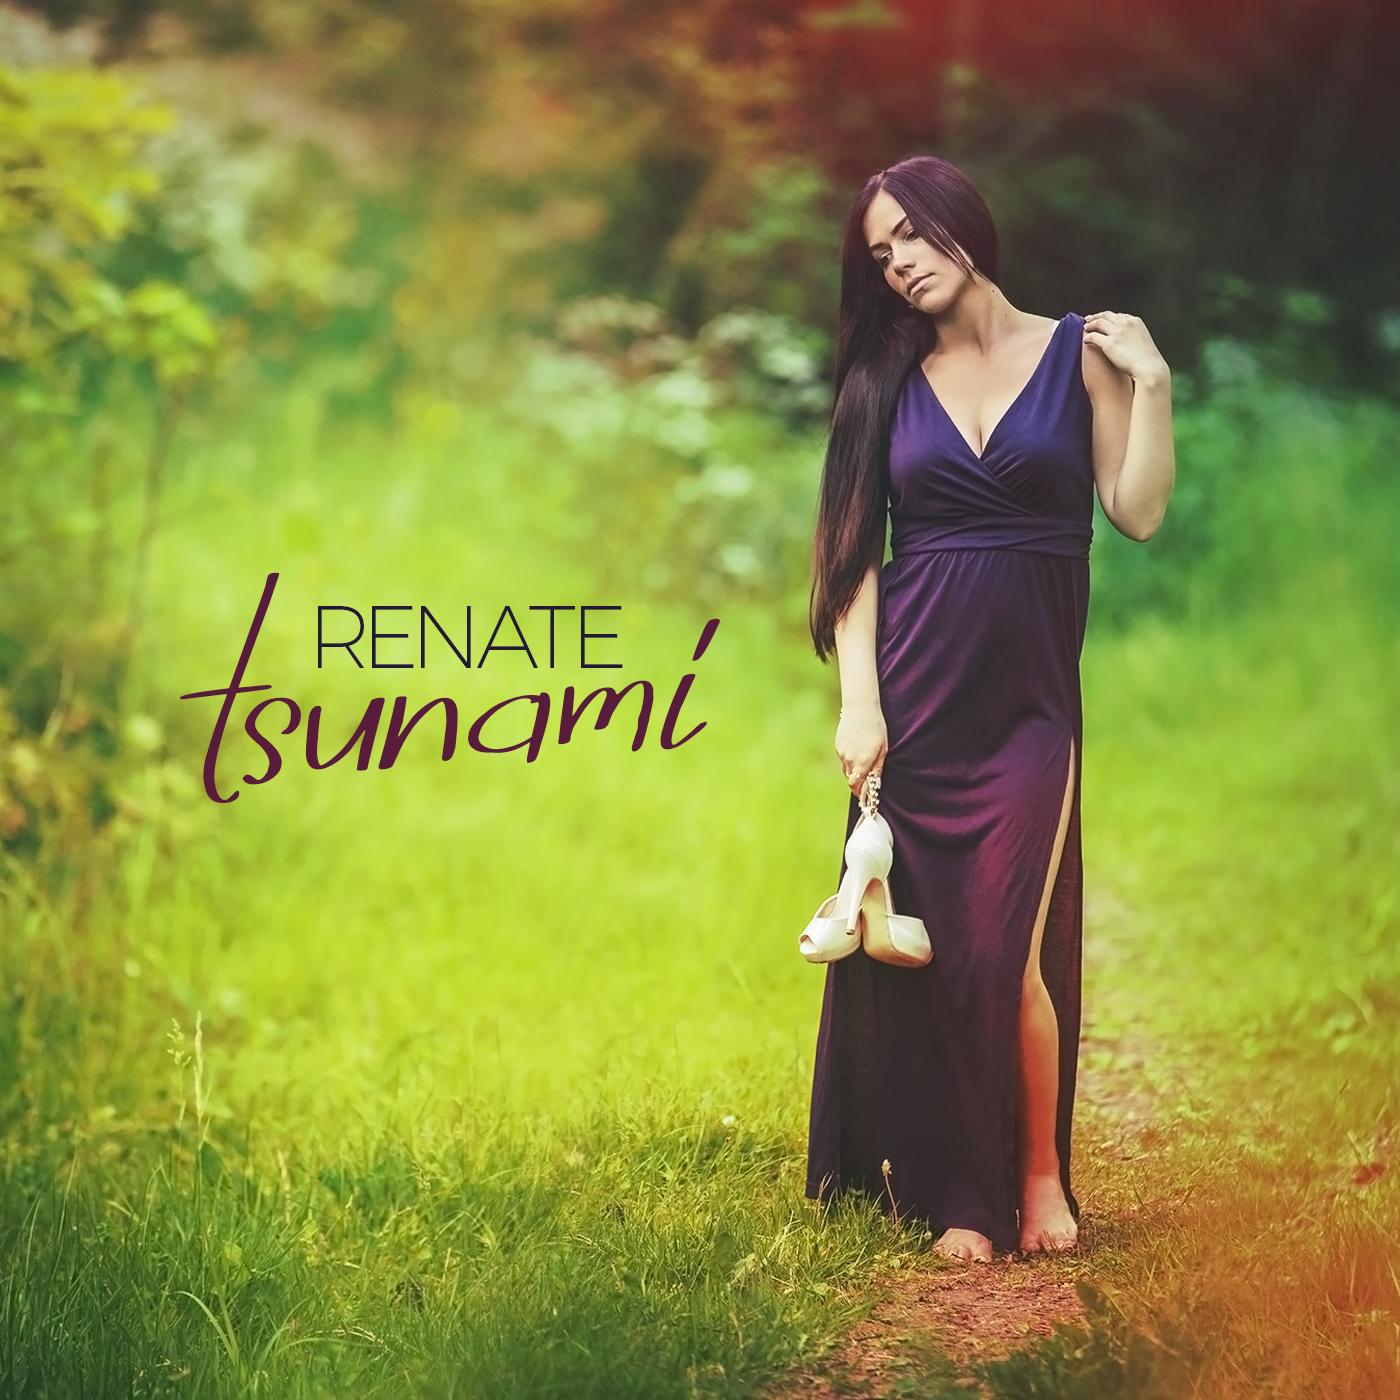 Renate---Tsunami----iTunesCover1400-v2